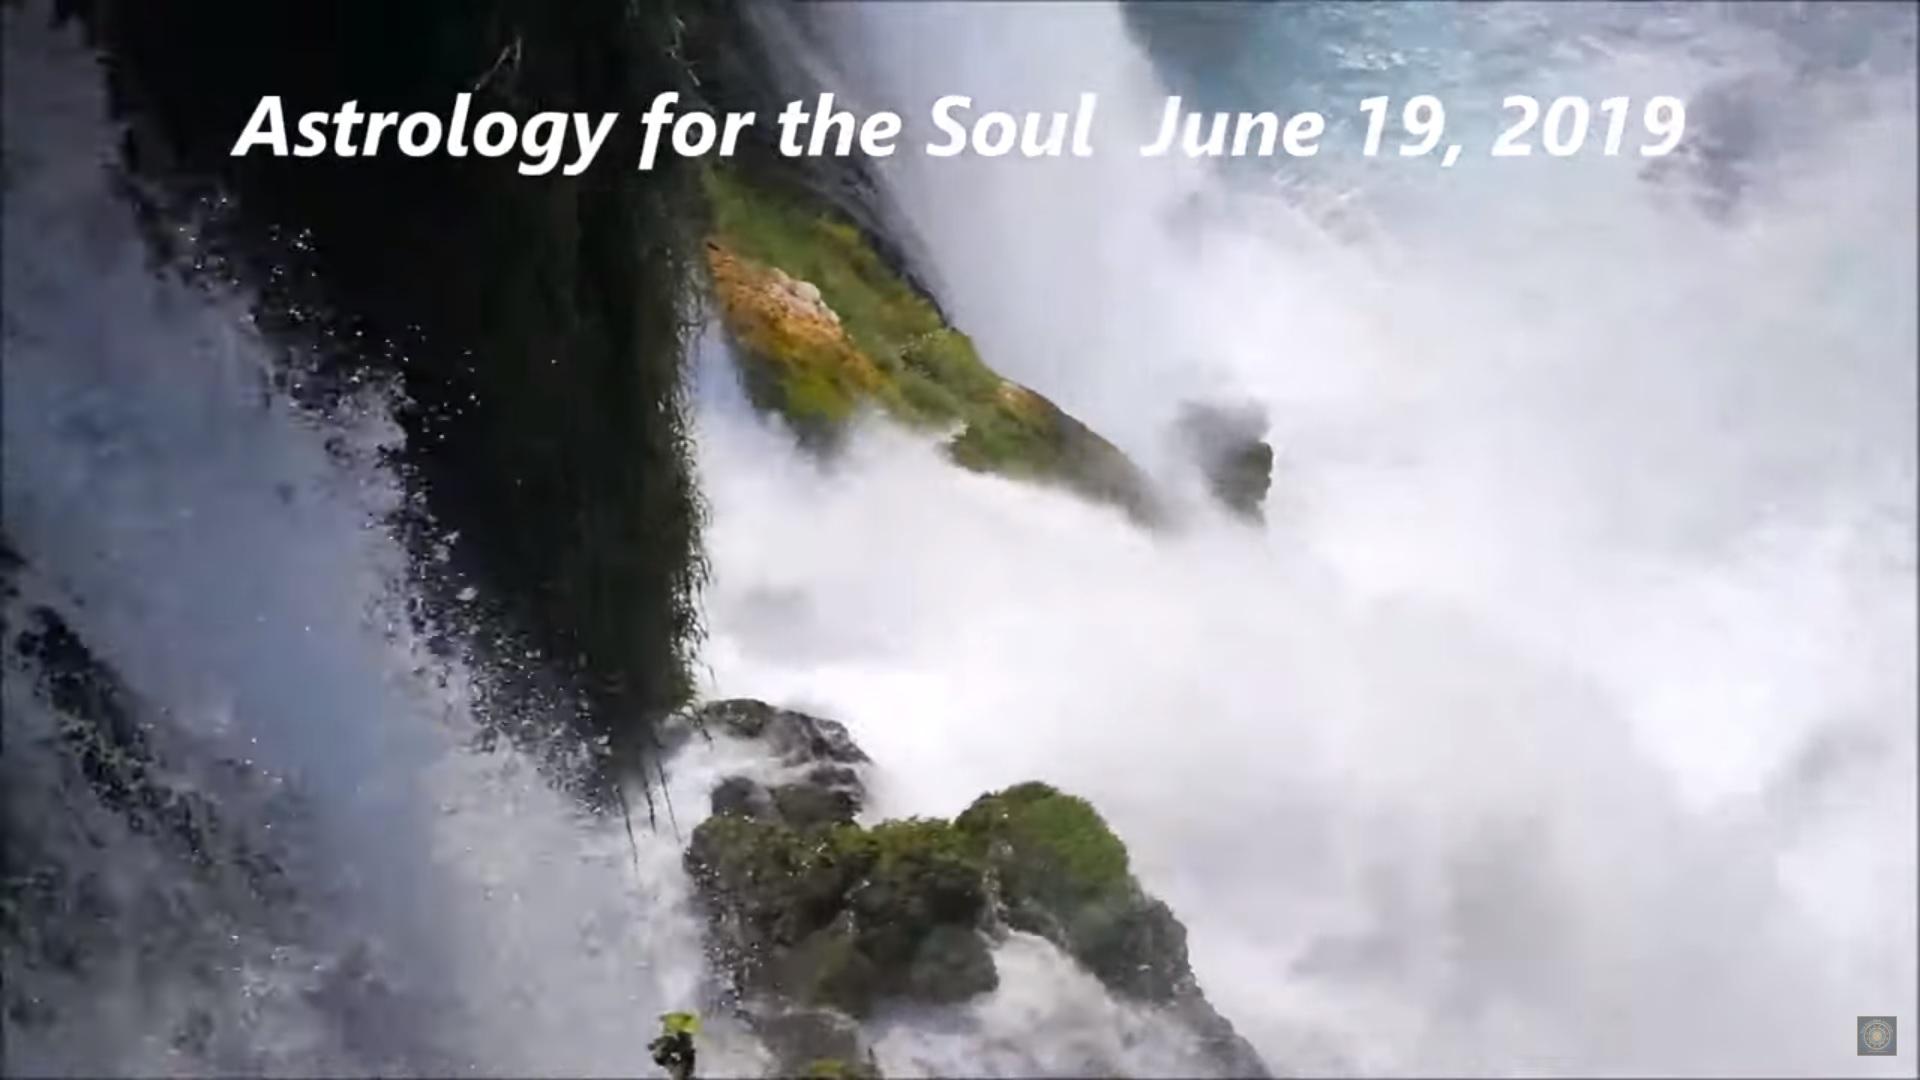 June 19, 2019 – Pele Report, Astrology Forecast